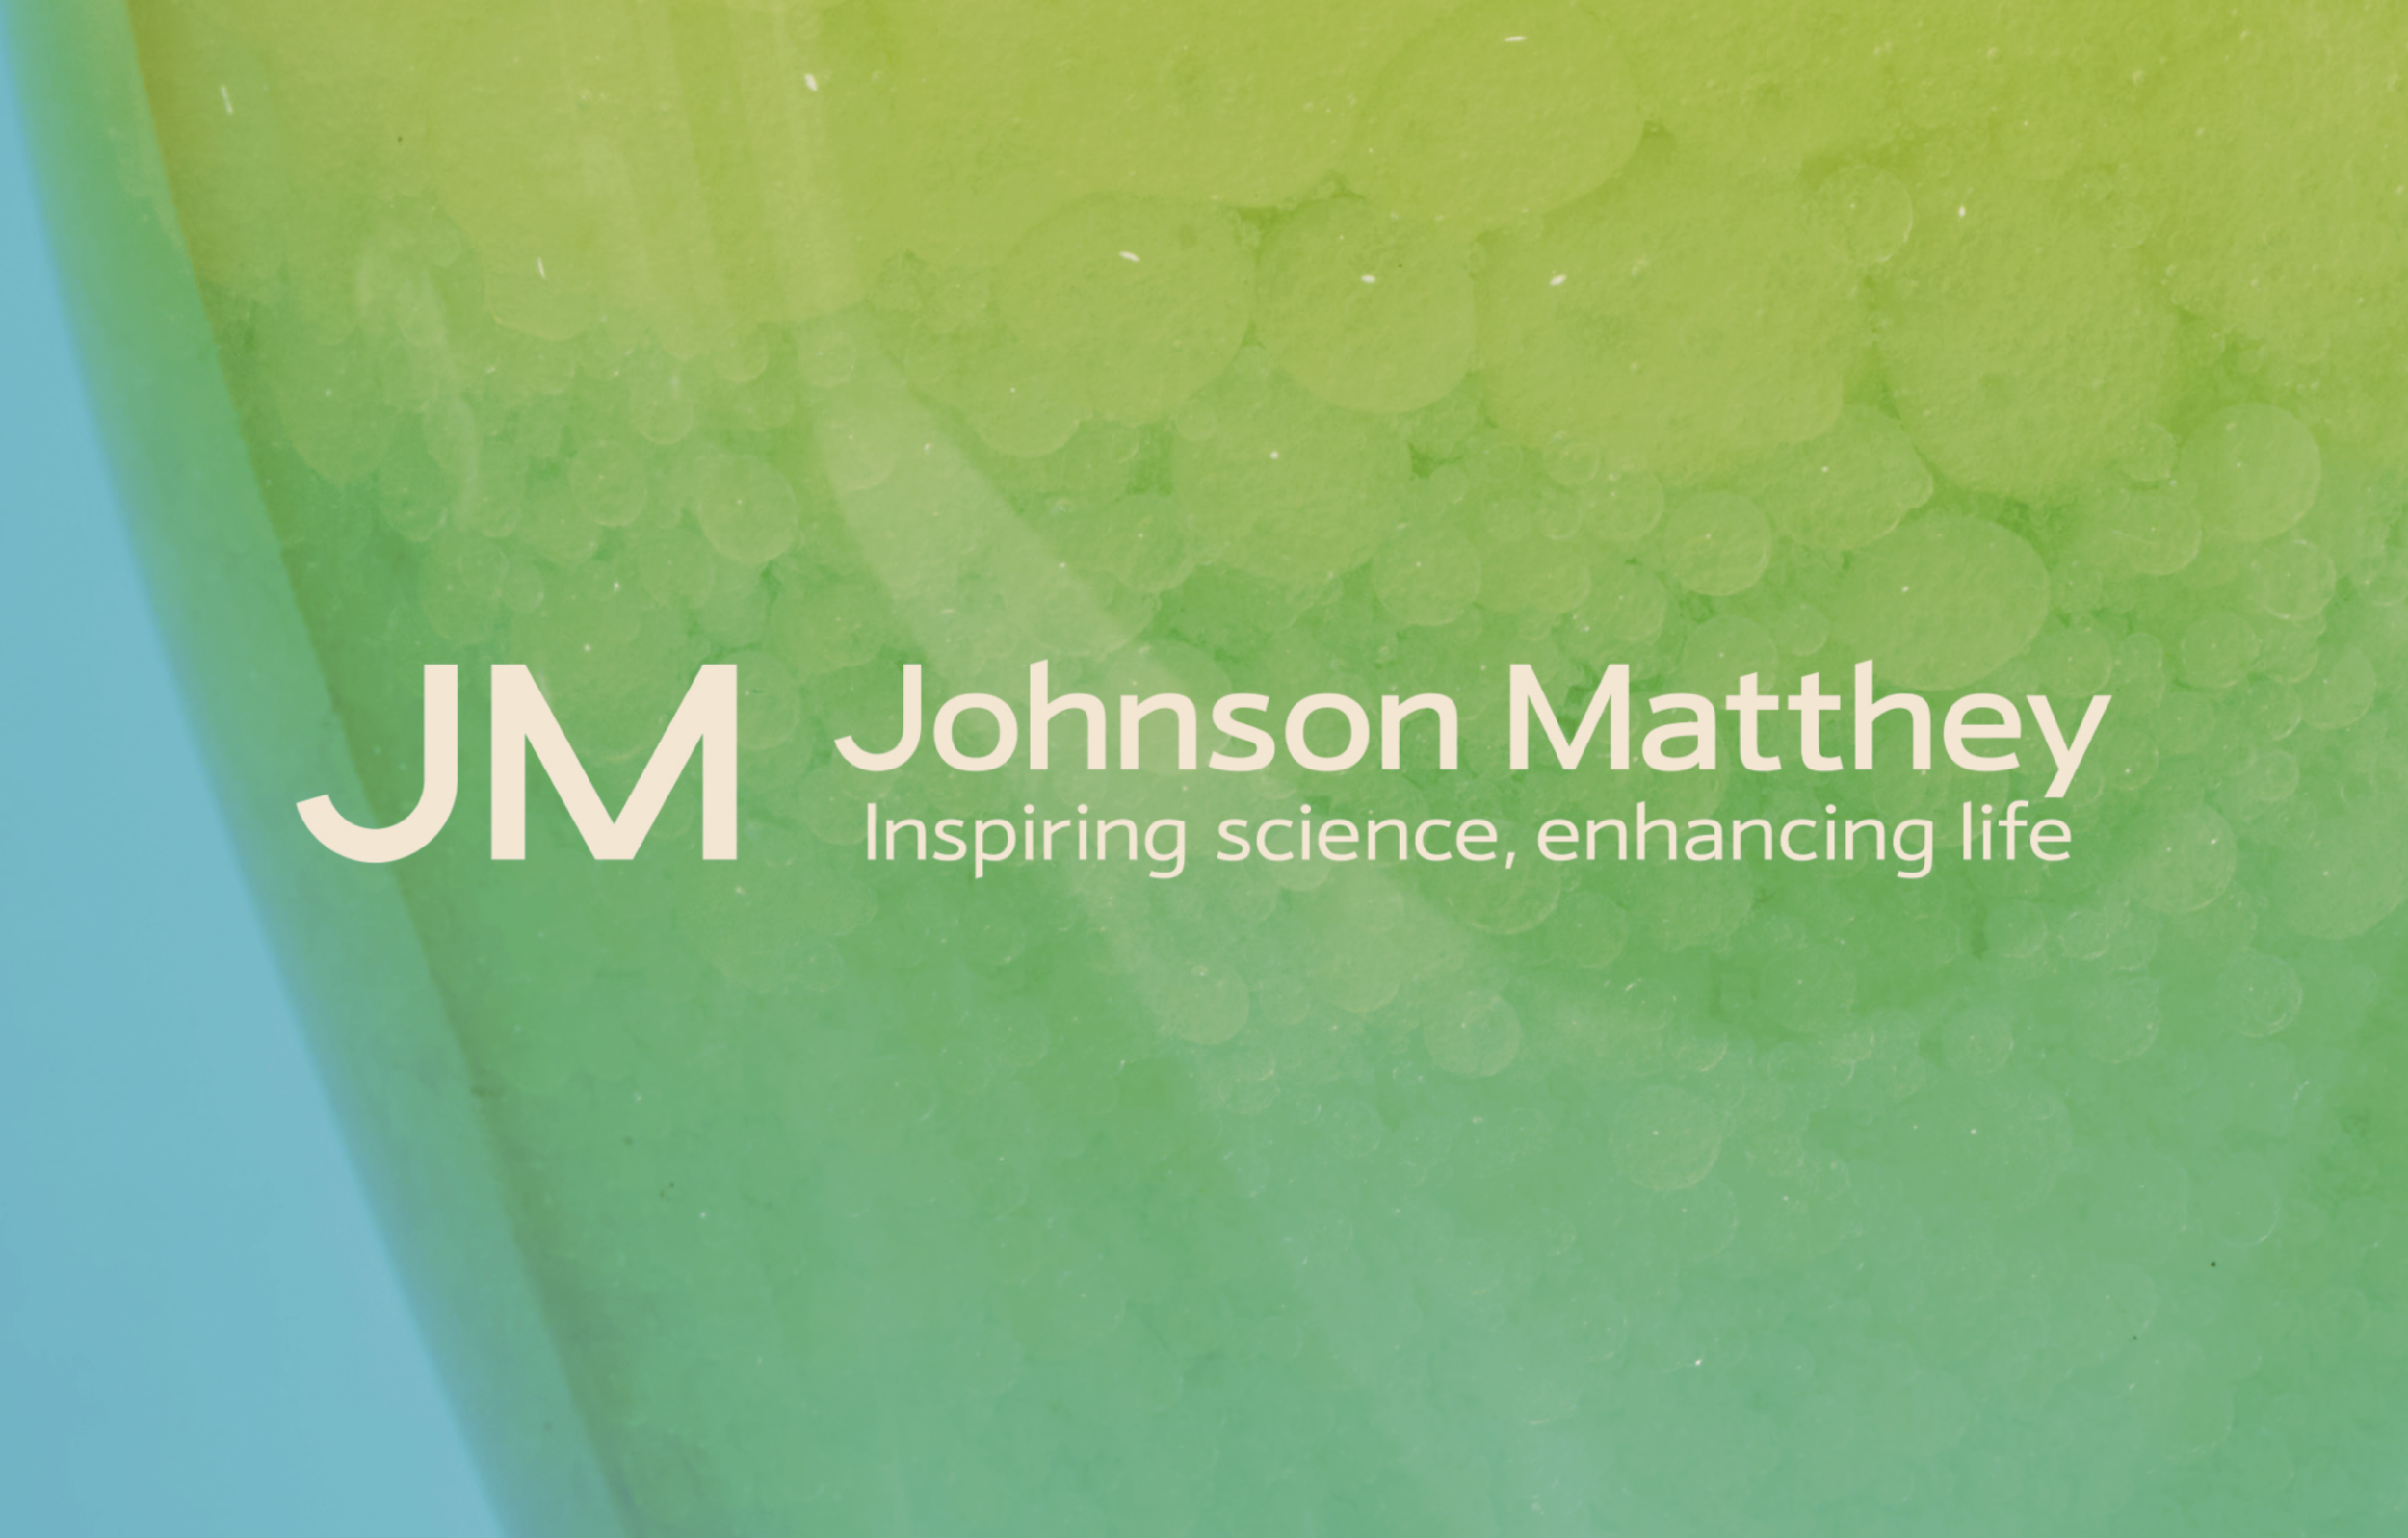 Johnson Matthey Case Study Thumbnail-01-01.png